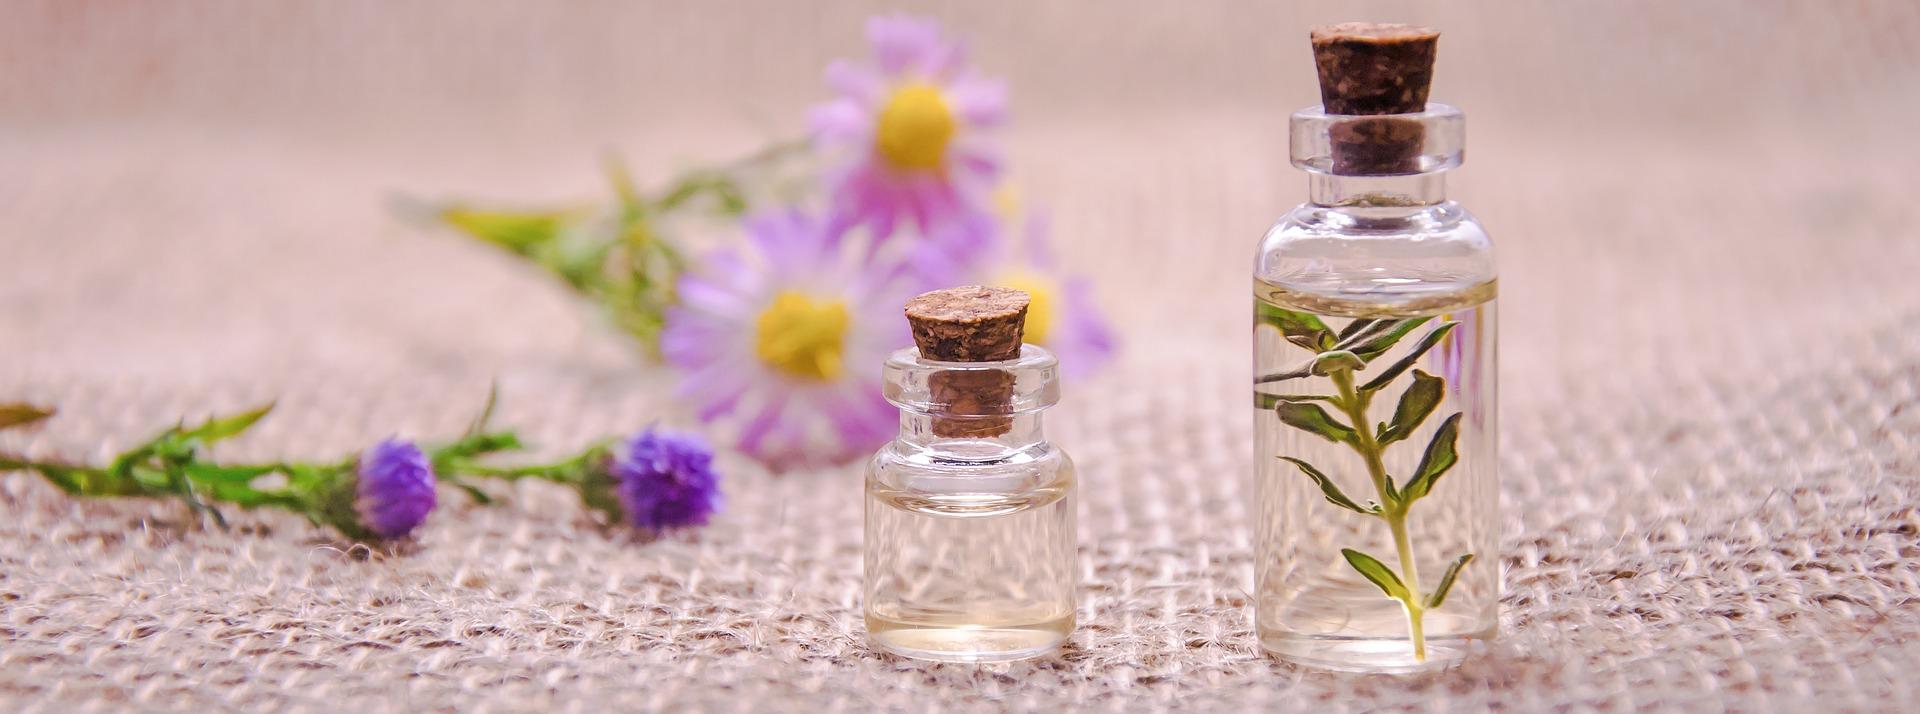 essential-oils-3084952_1920cZPsRQ7ReNKjr